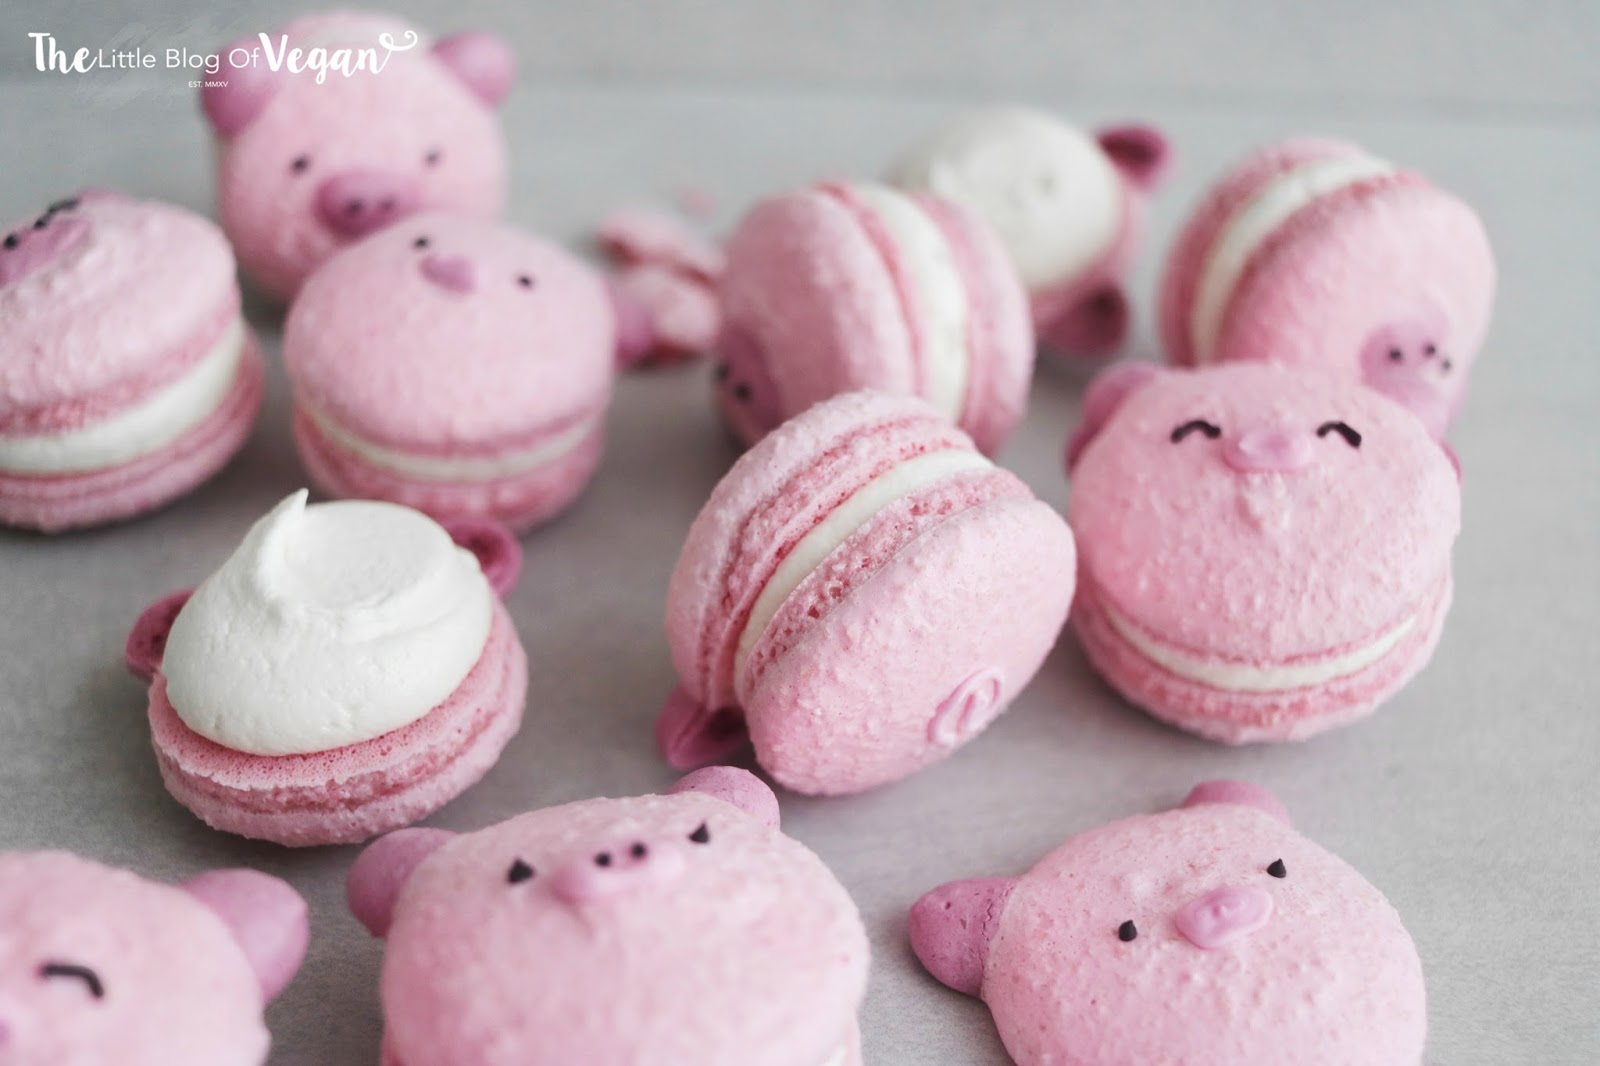 Raspberry 'pig' macaron recipe | The Little Blog Of Vegan